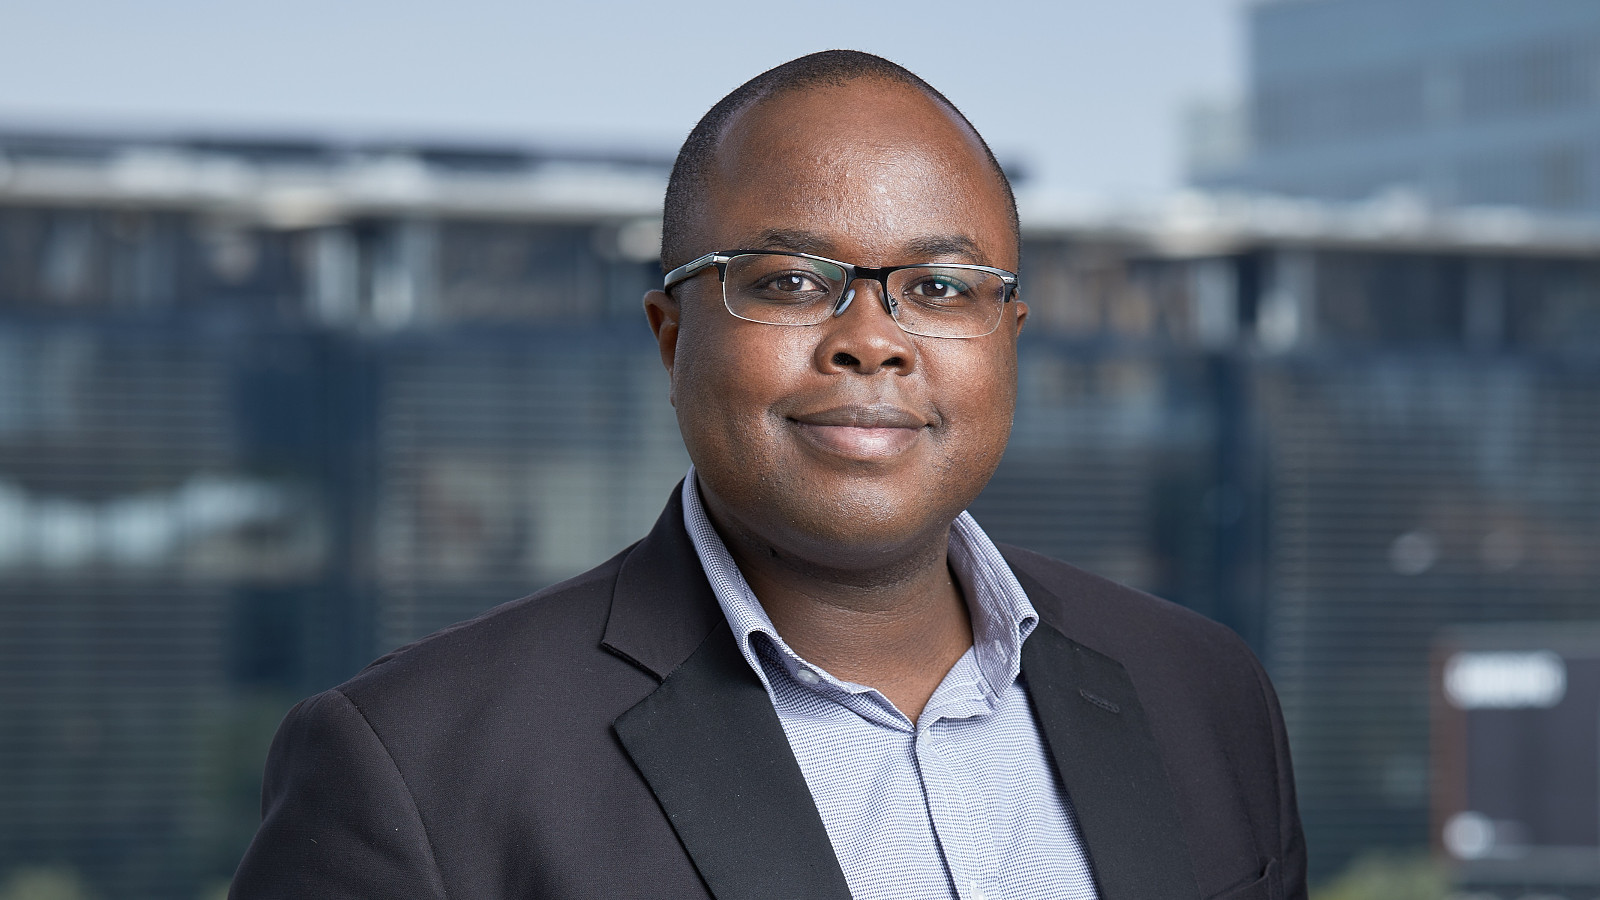 Featured image: Nkazi Sokhulu, CEO and co-founder of Yalu (Supplied)